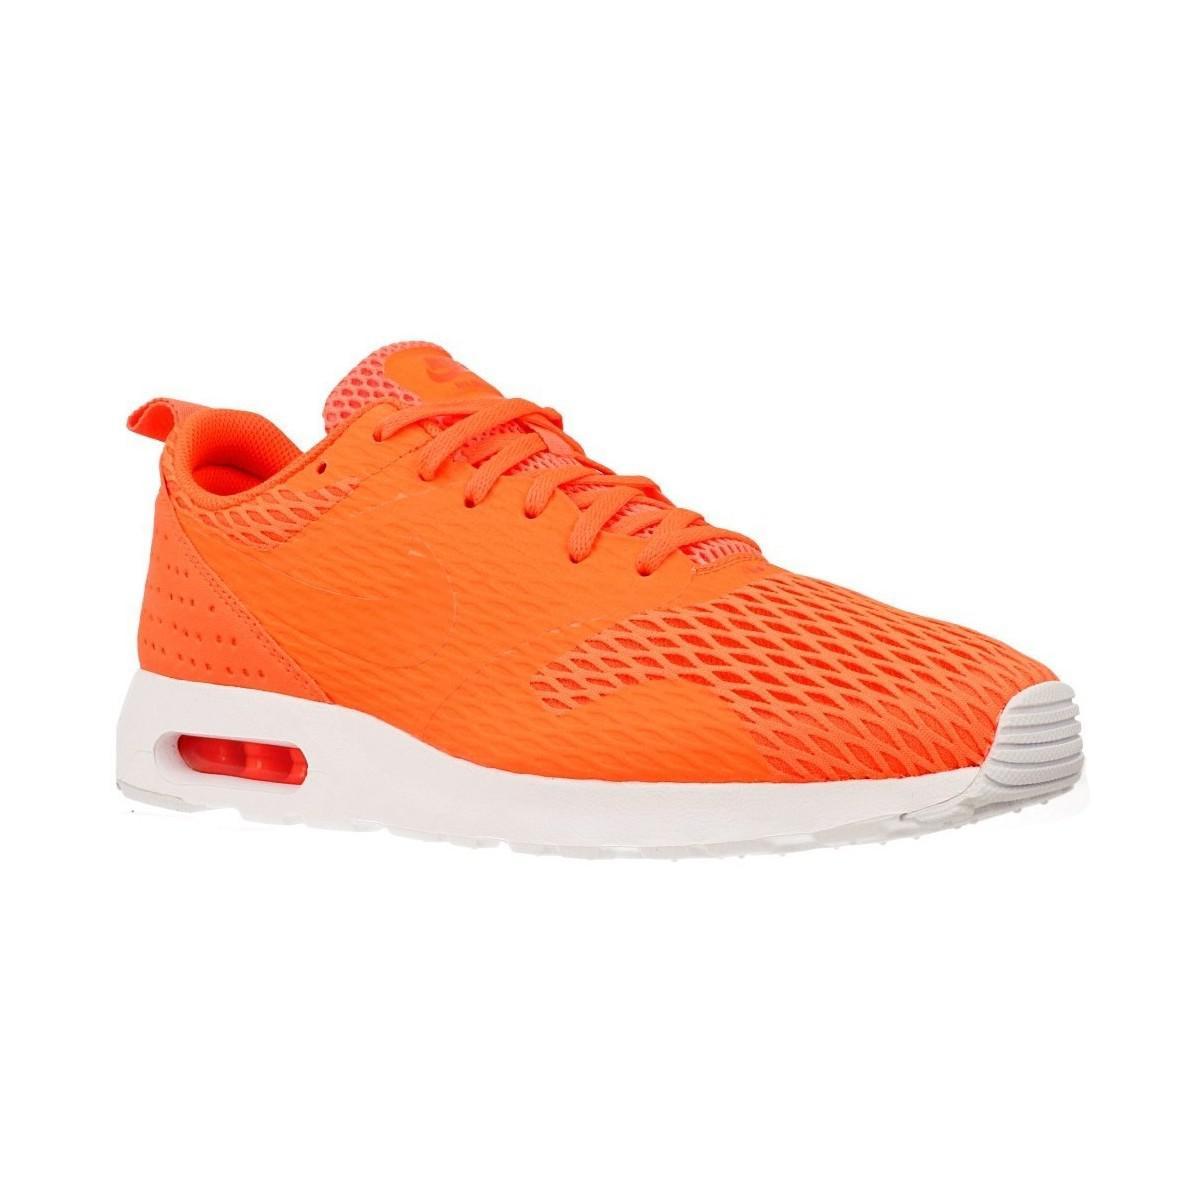 best sneakers cac50 4605c coupon for nike. air max tavas d92b5 c93c2